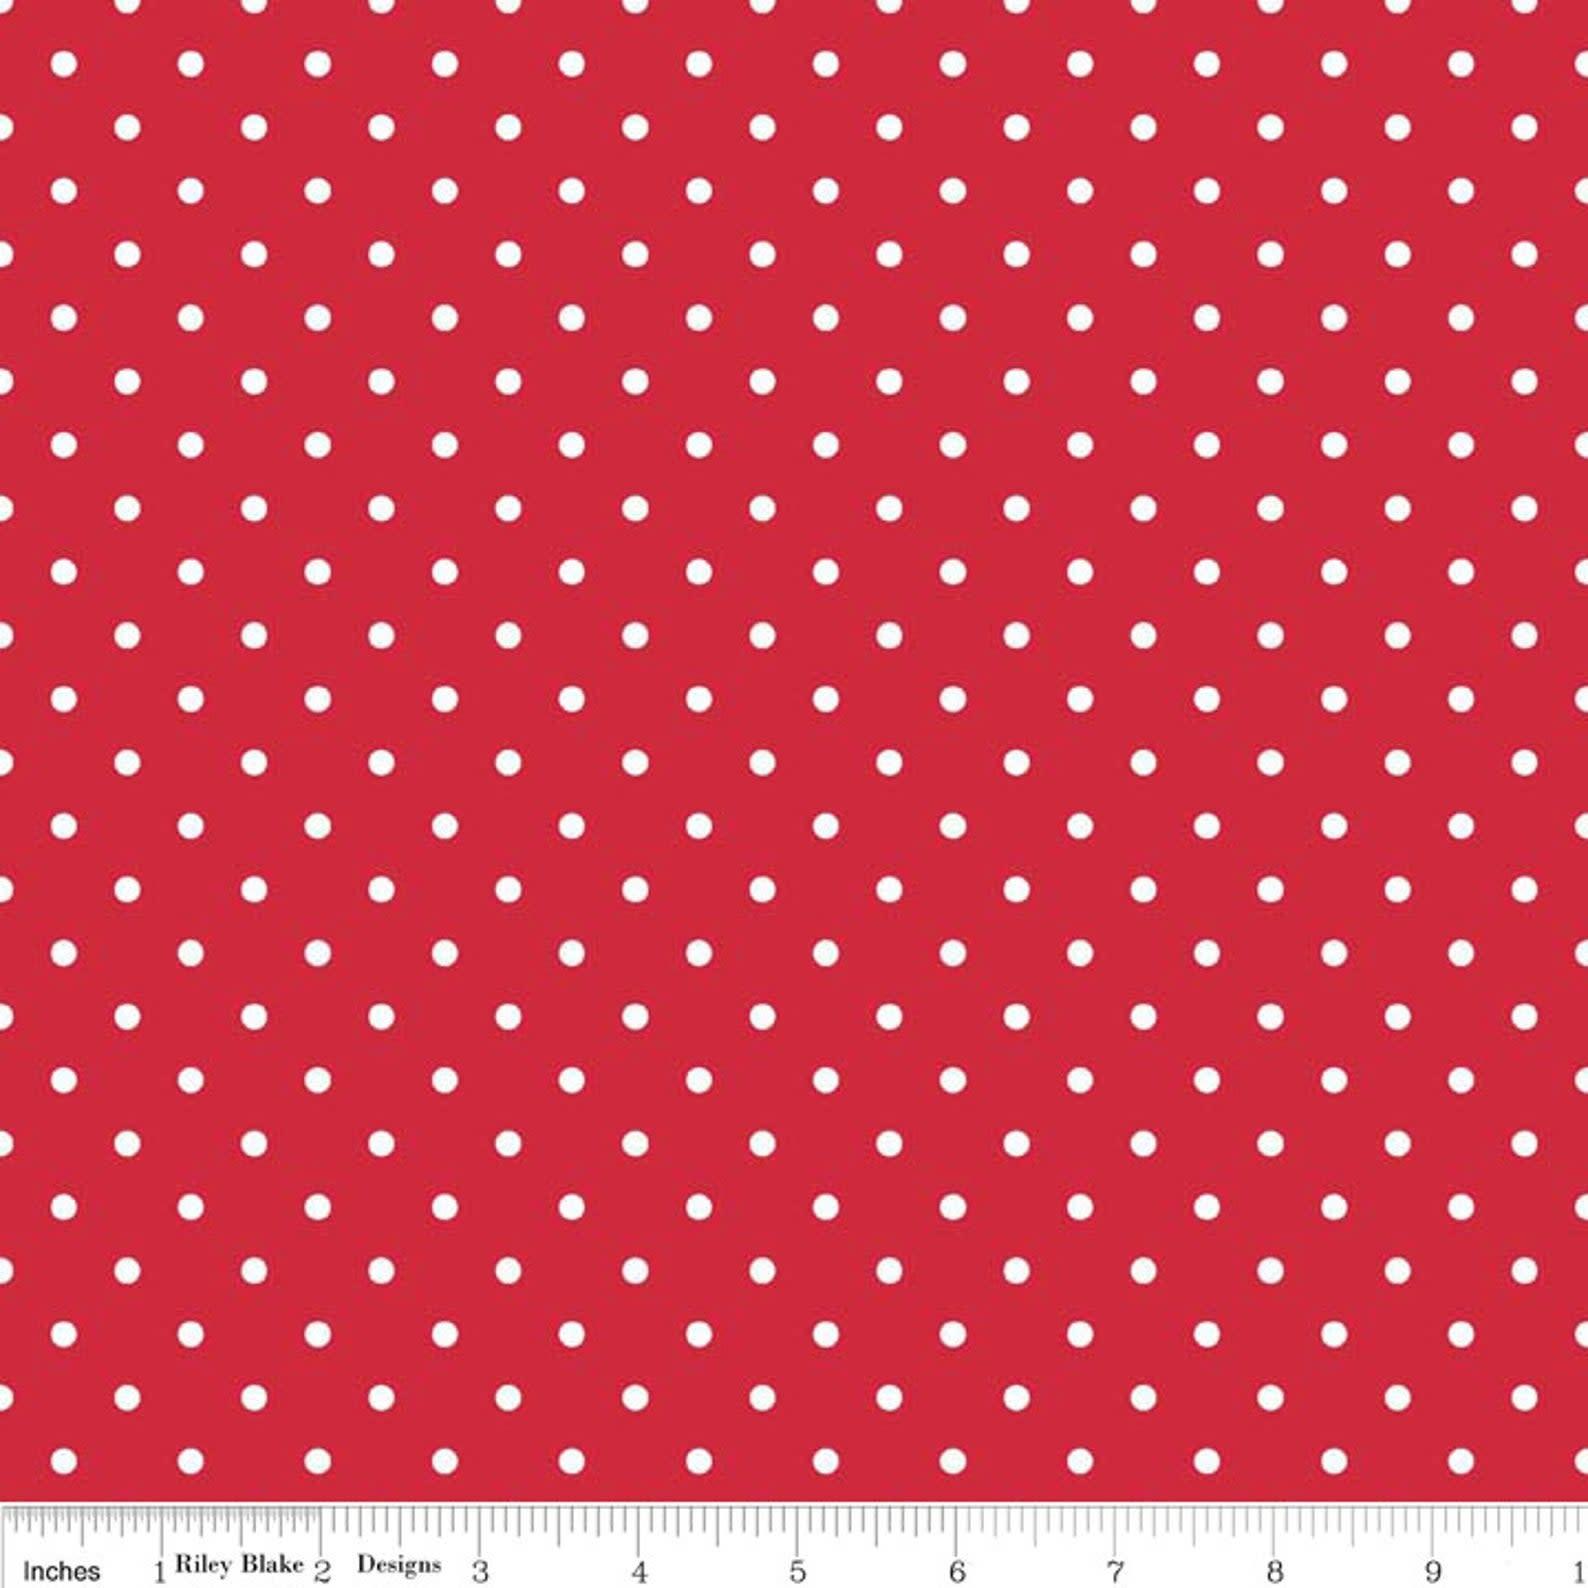 RILEY BLAKE DESIGNS SWISS & DOT, RED $.20CM, $20M